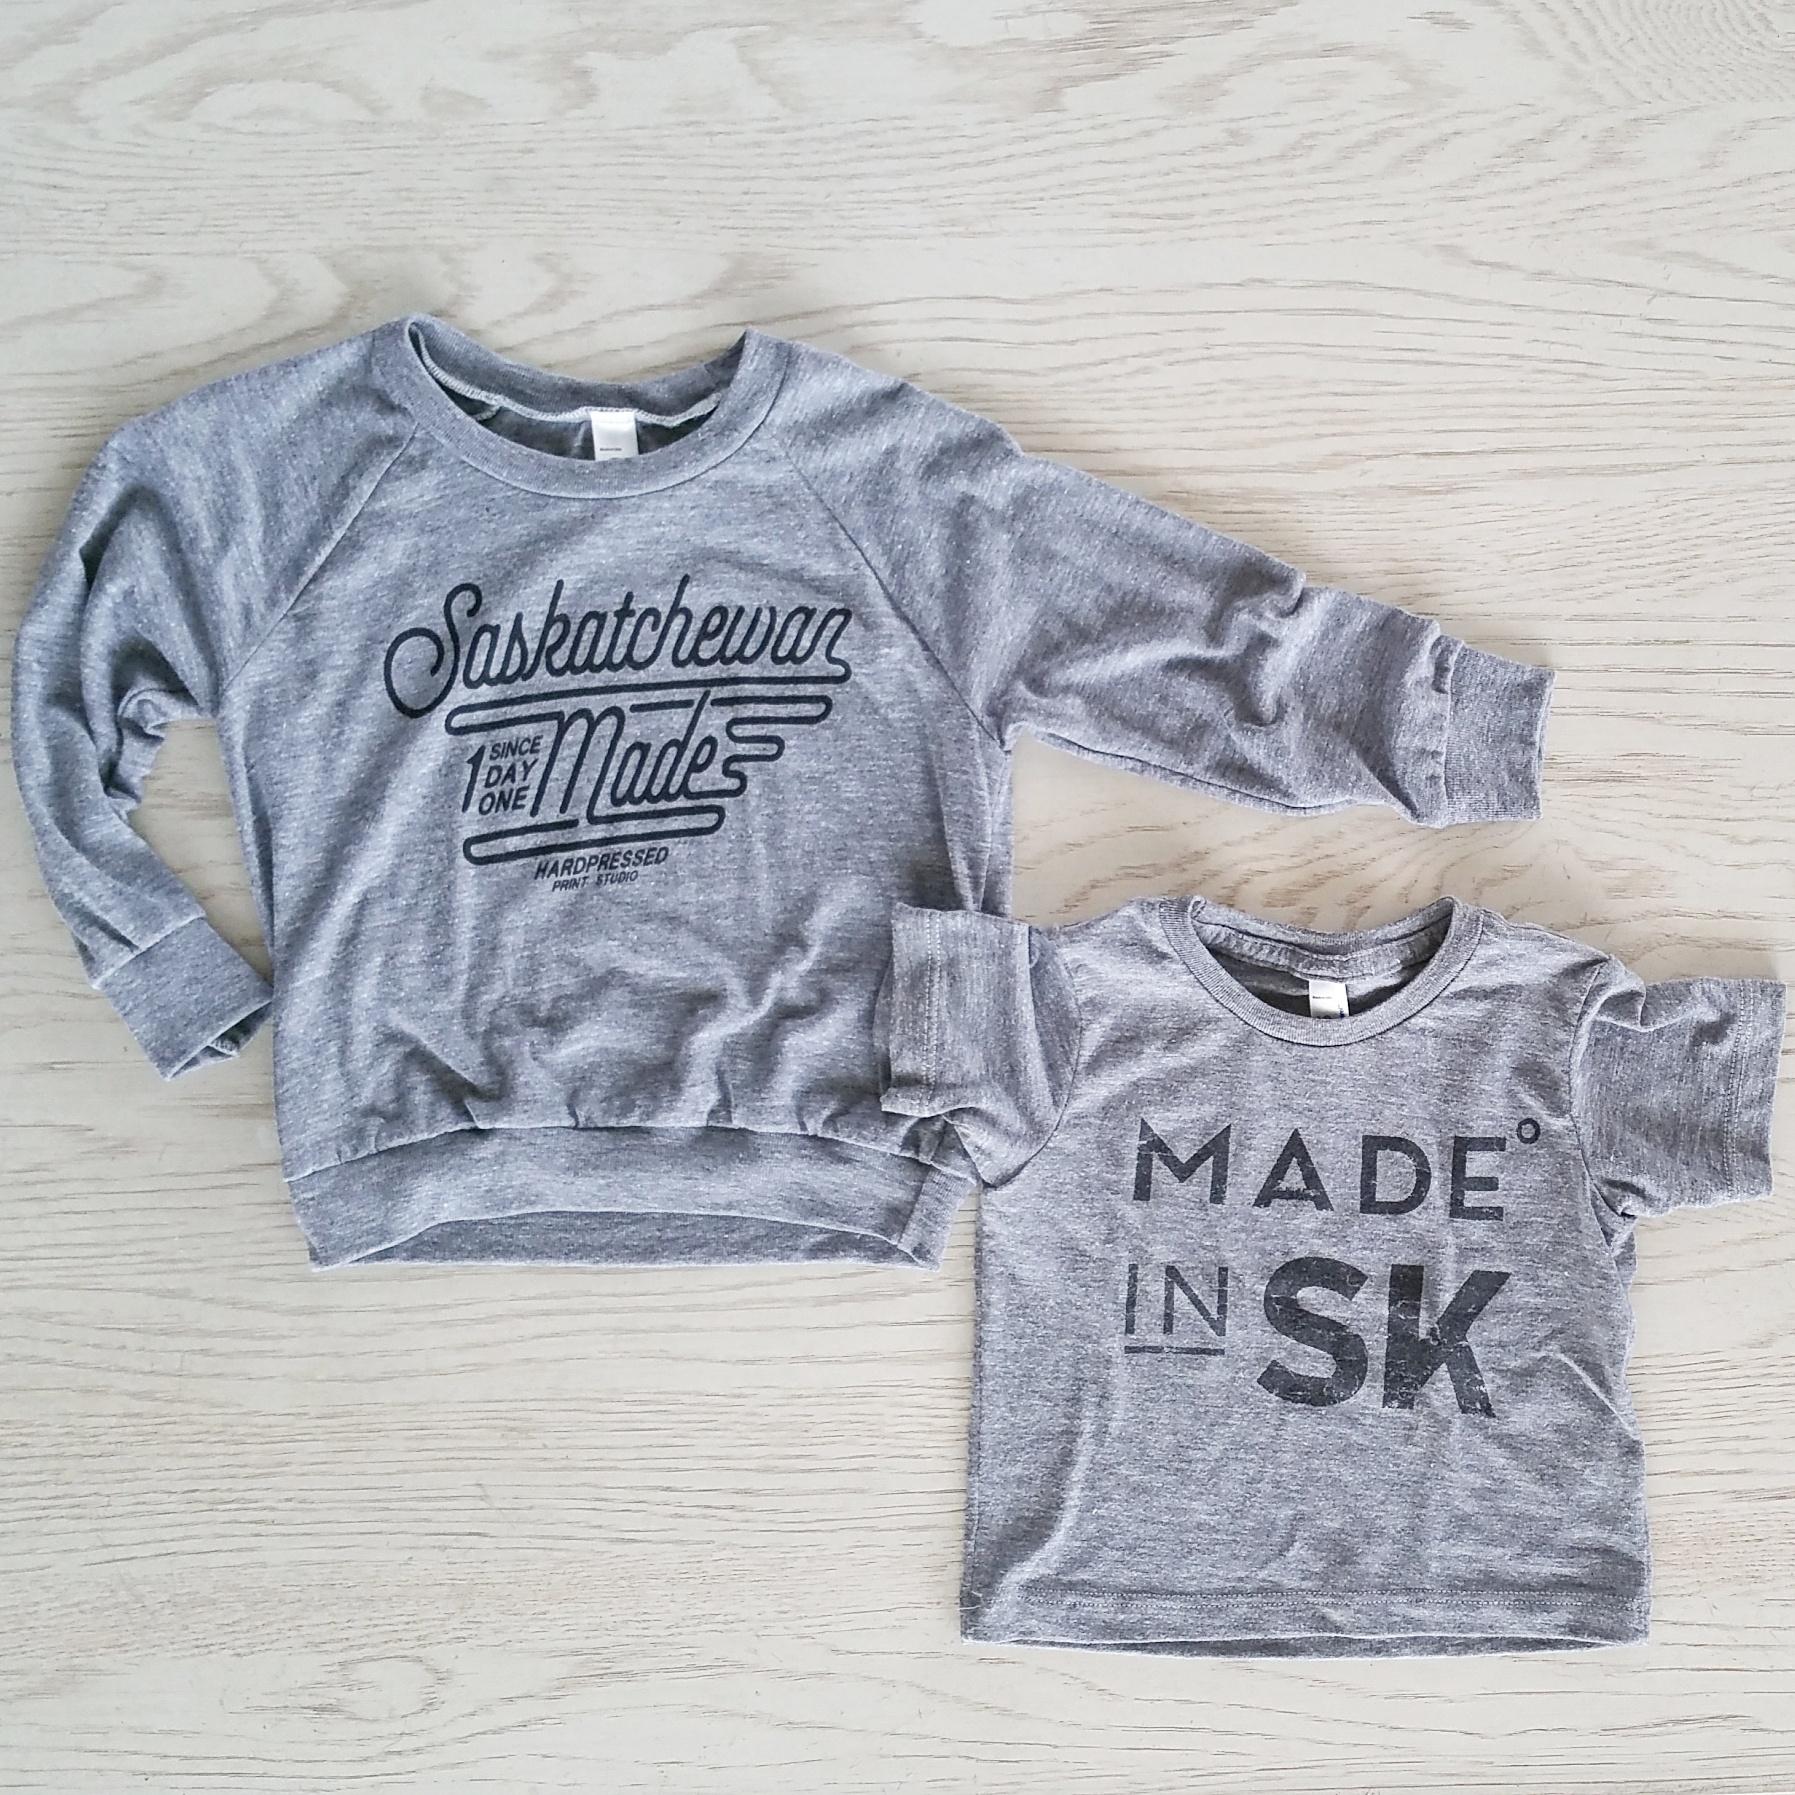 Hardpressed Saskatoon baby clothes